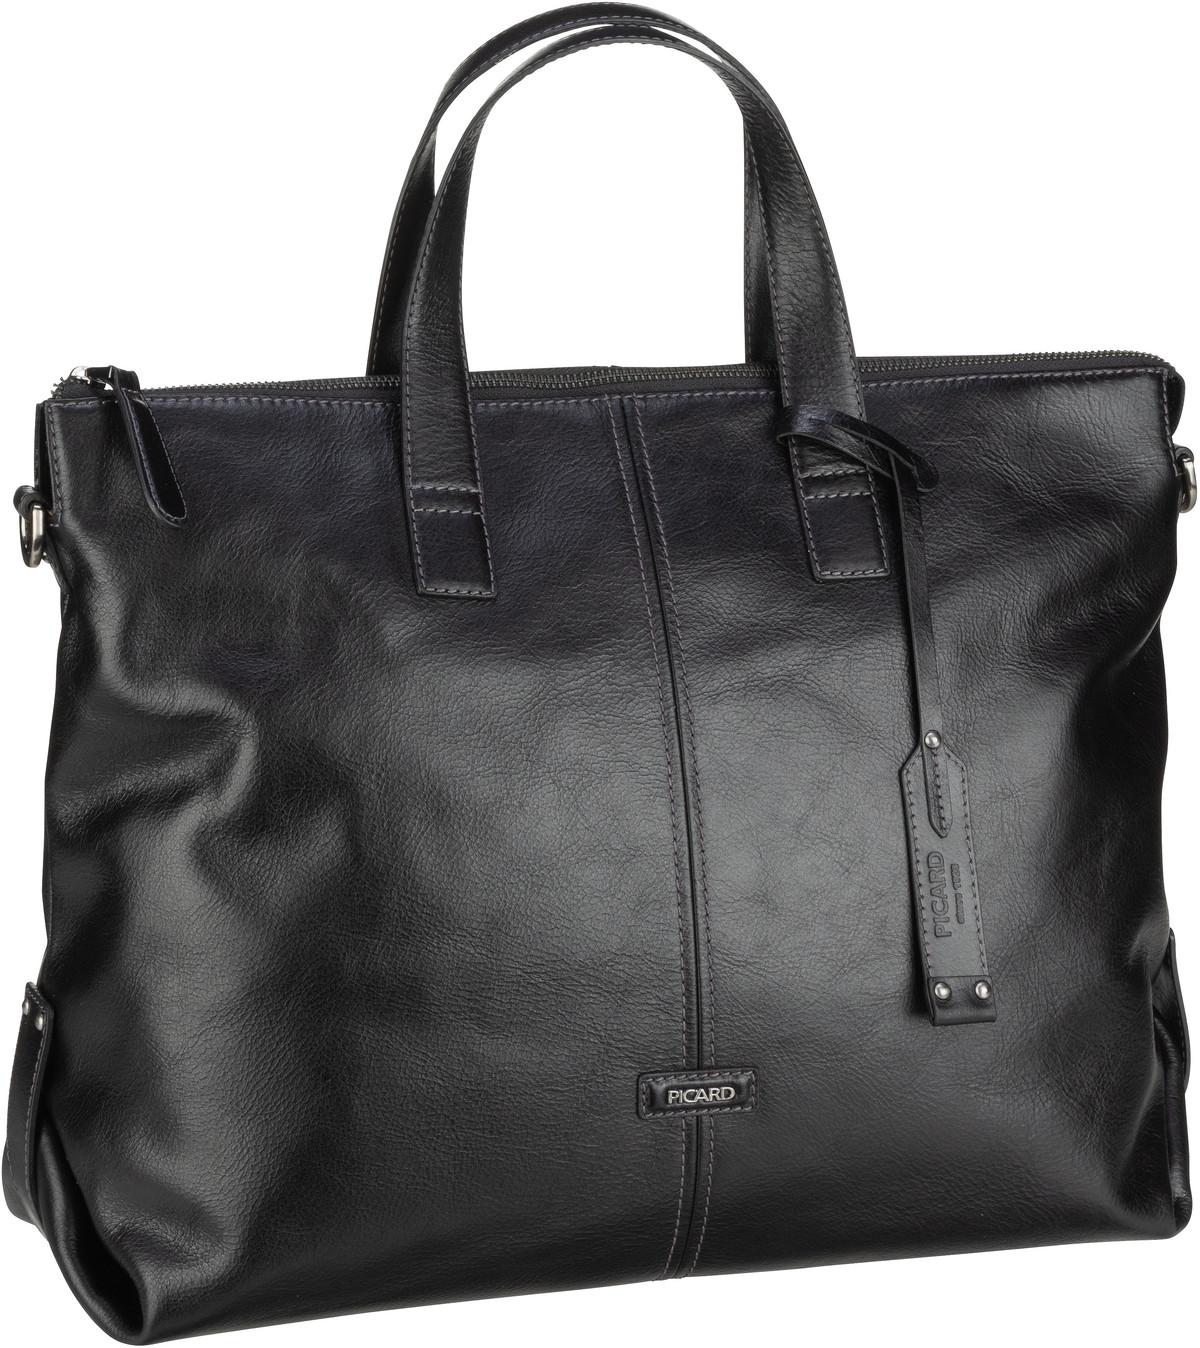 Handtasche Eternity 5073 Schwarz